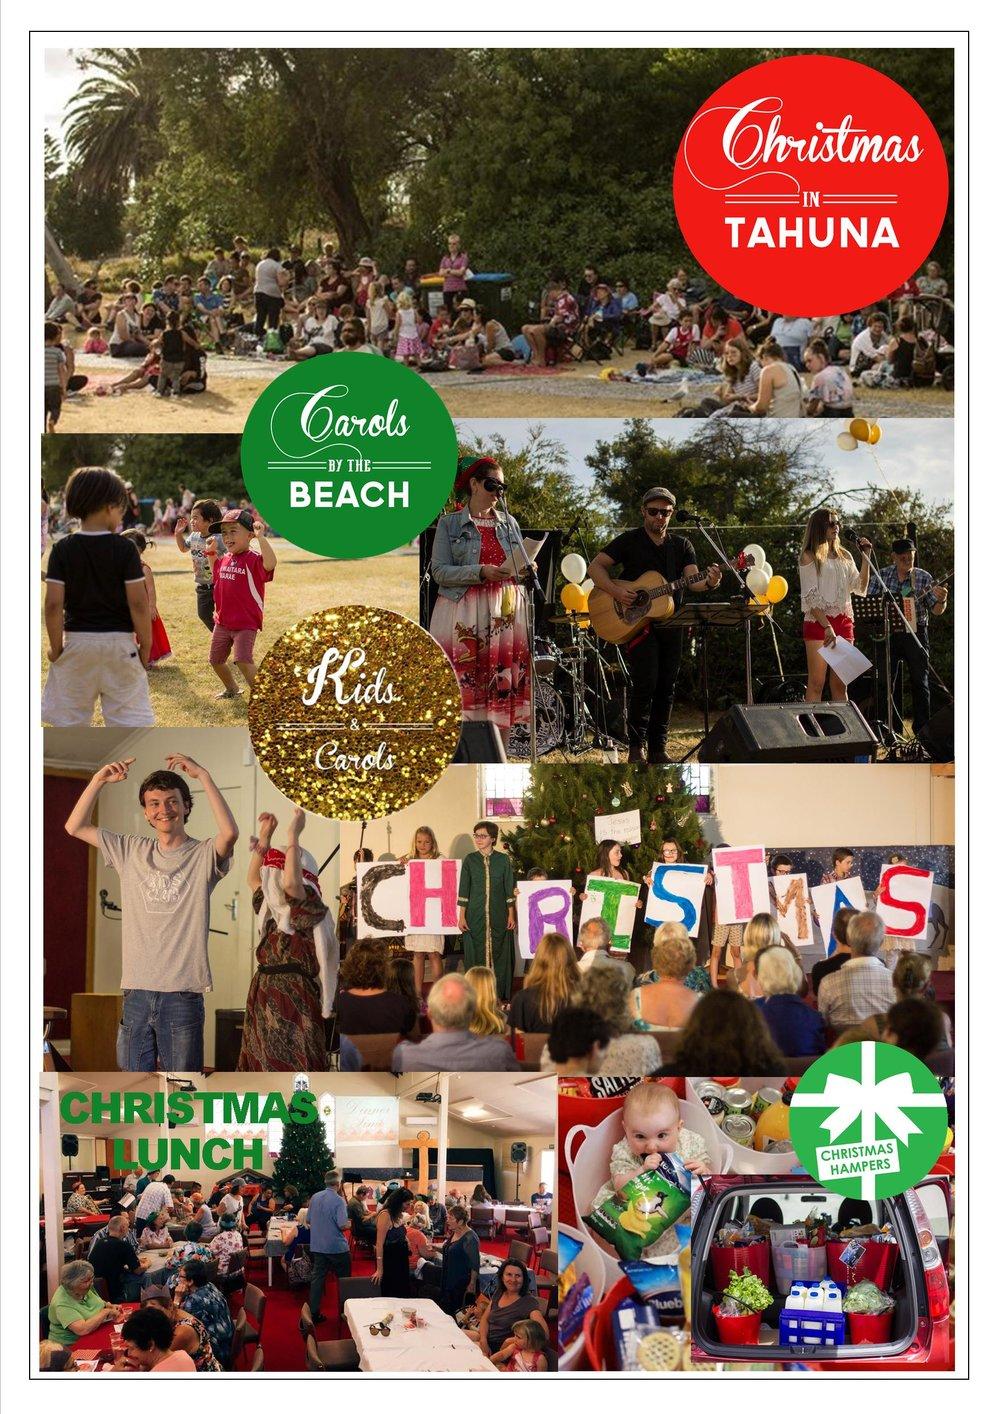 24th December page 8.jpg